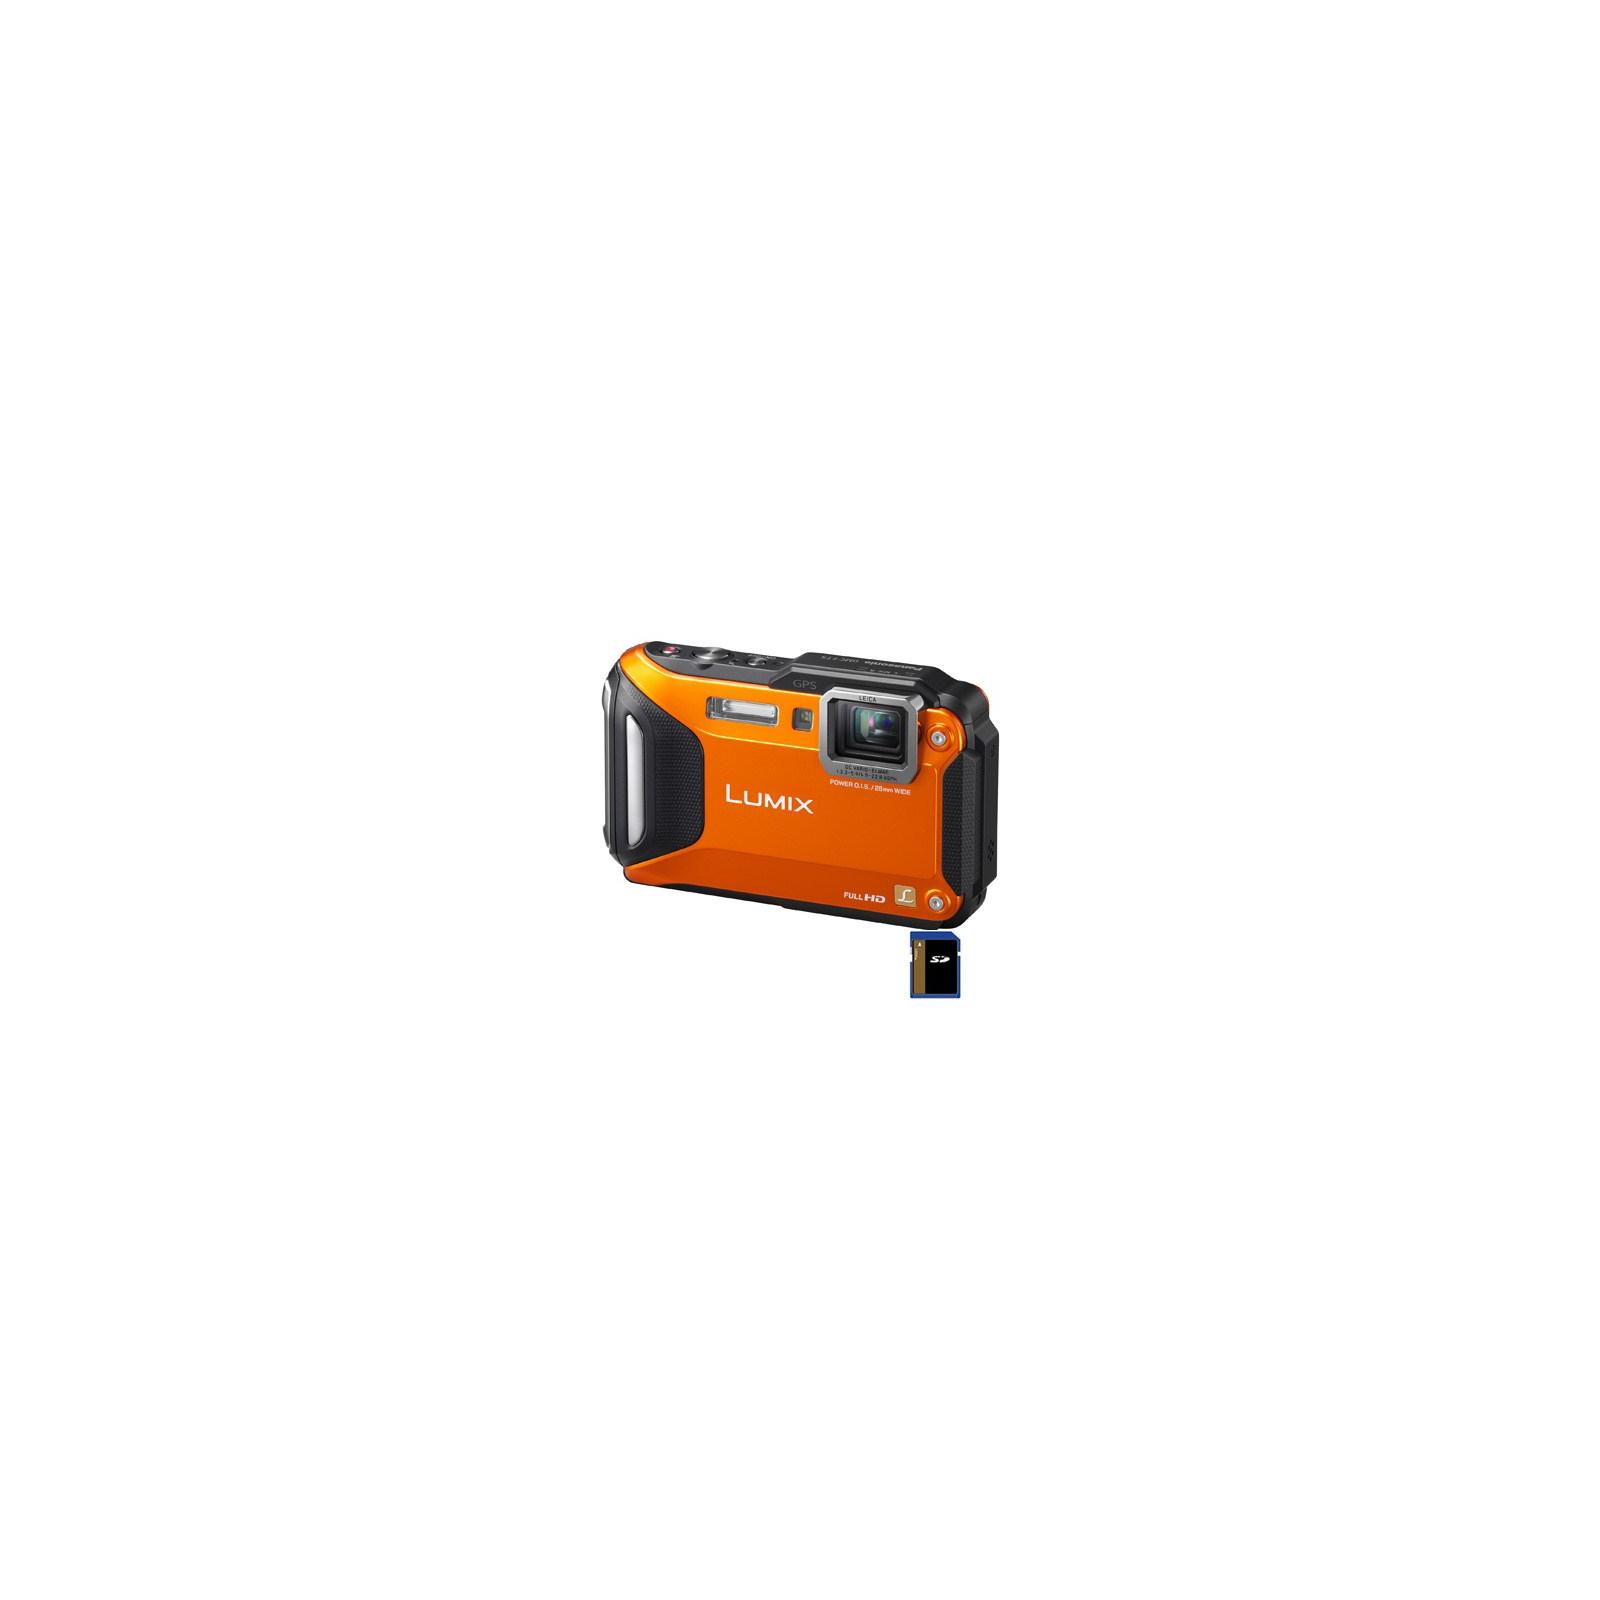 Цифровой фотоаппарат PANASONIC Lumix DMC-FT5 orange (DMC-FT5EA-D)